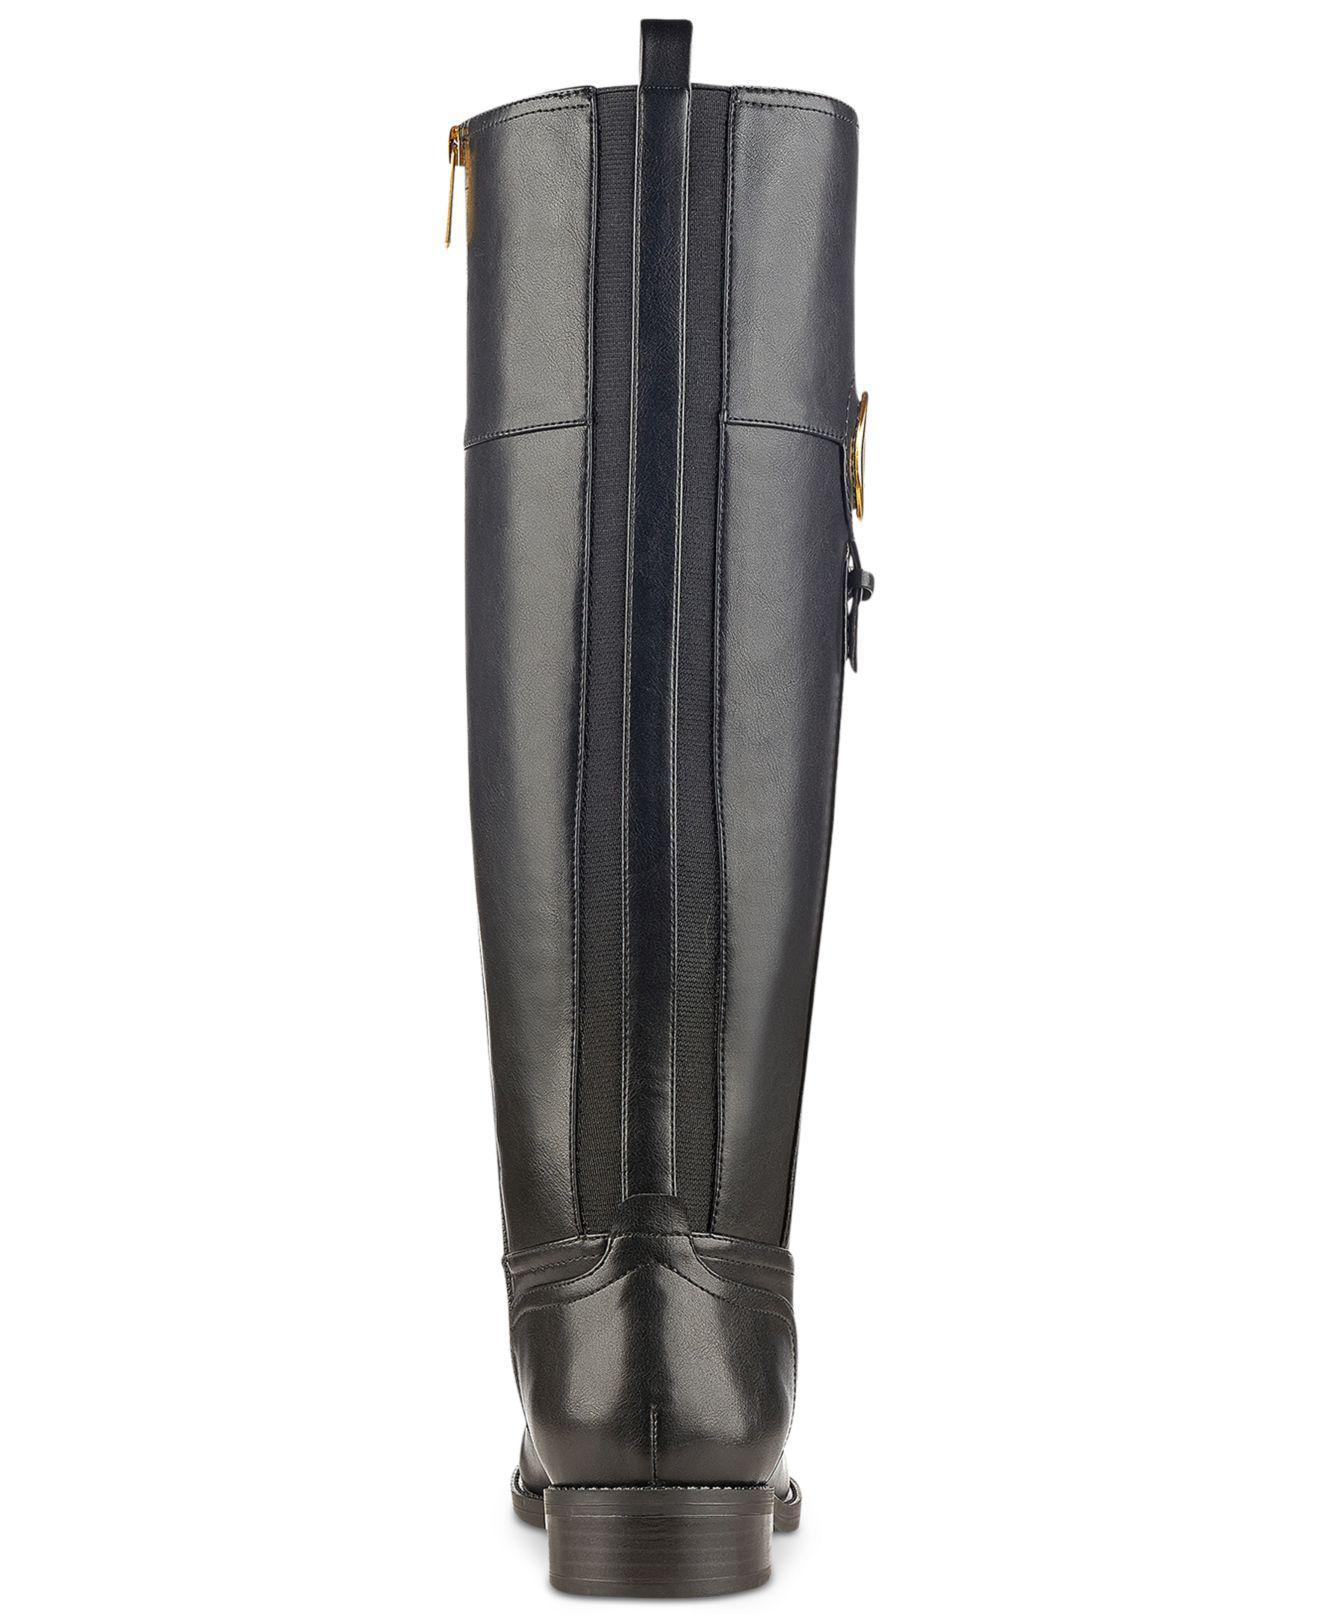 9c1d68a6c750f1 Tommy Hilfiger - Black Ilia2 Riding Boots - Lyst. View fullscreen